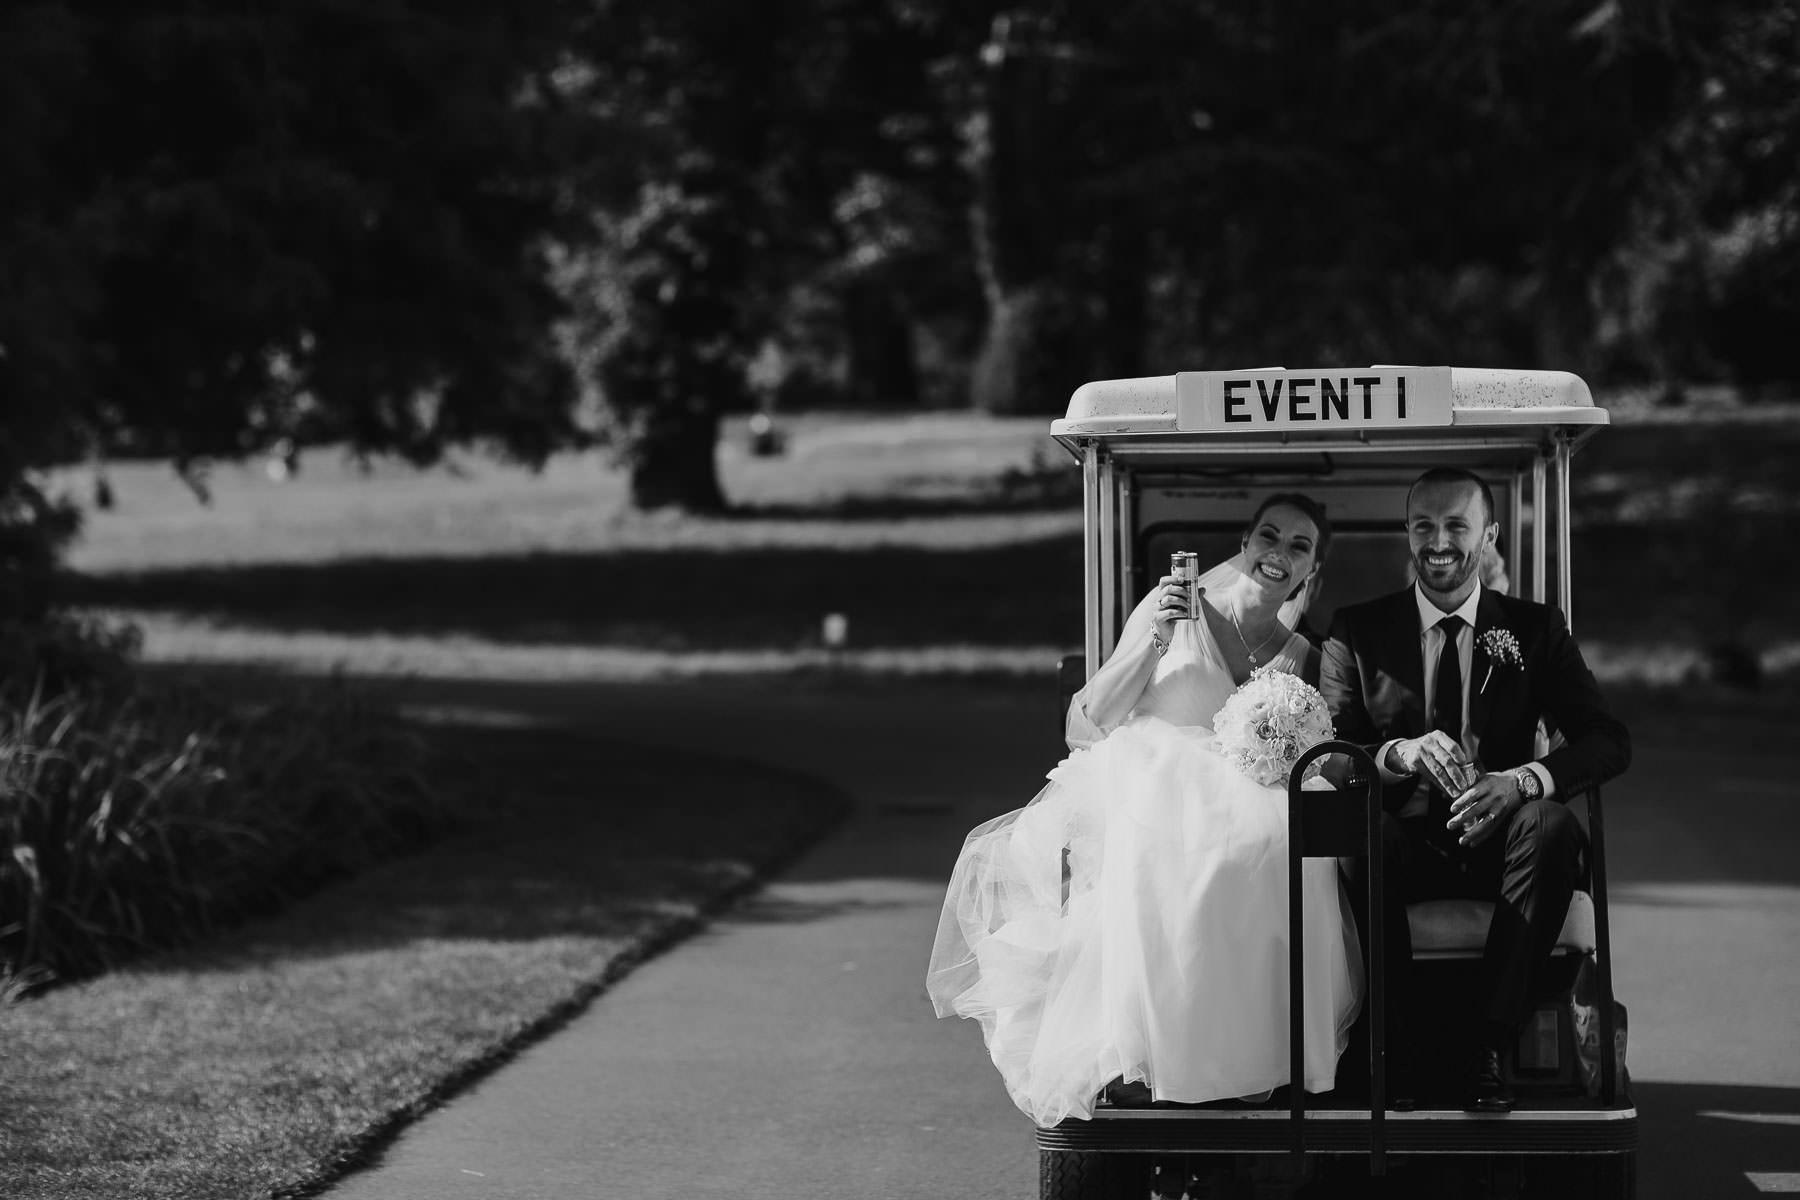 kew gardens wedding photography astra duncan39